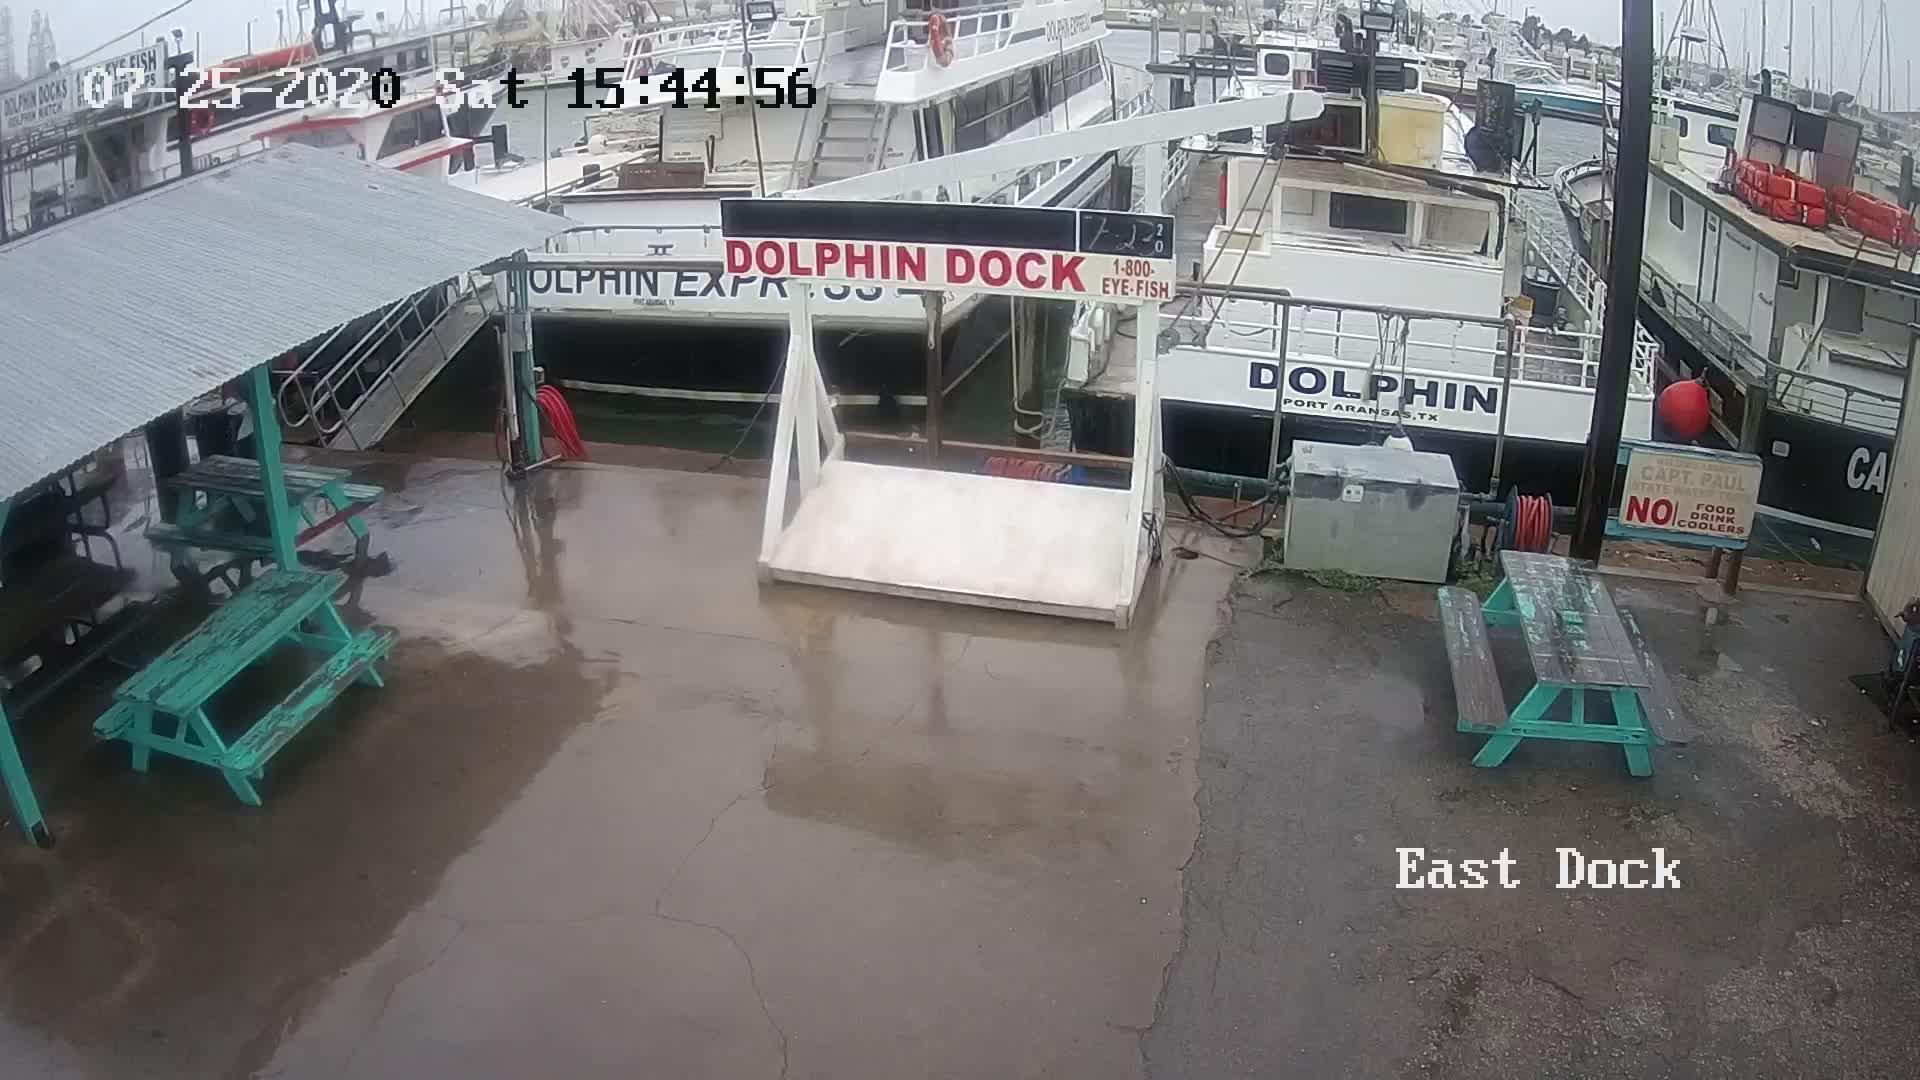 Port Aransas, TX Dolphin Dock Charters Webcam Recording Hanna (2020)